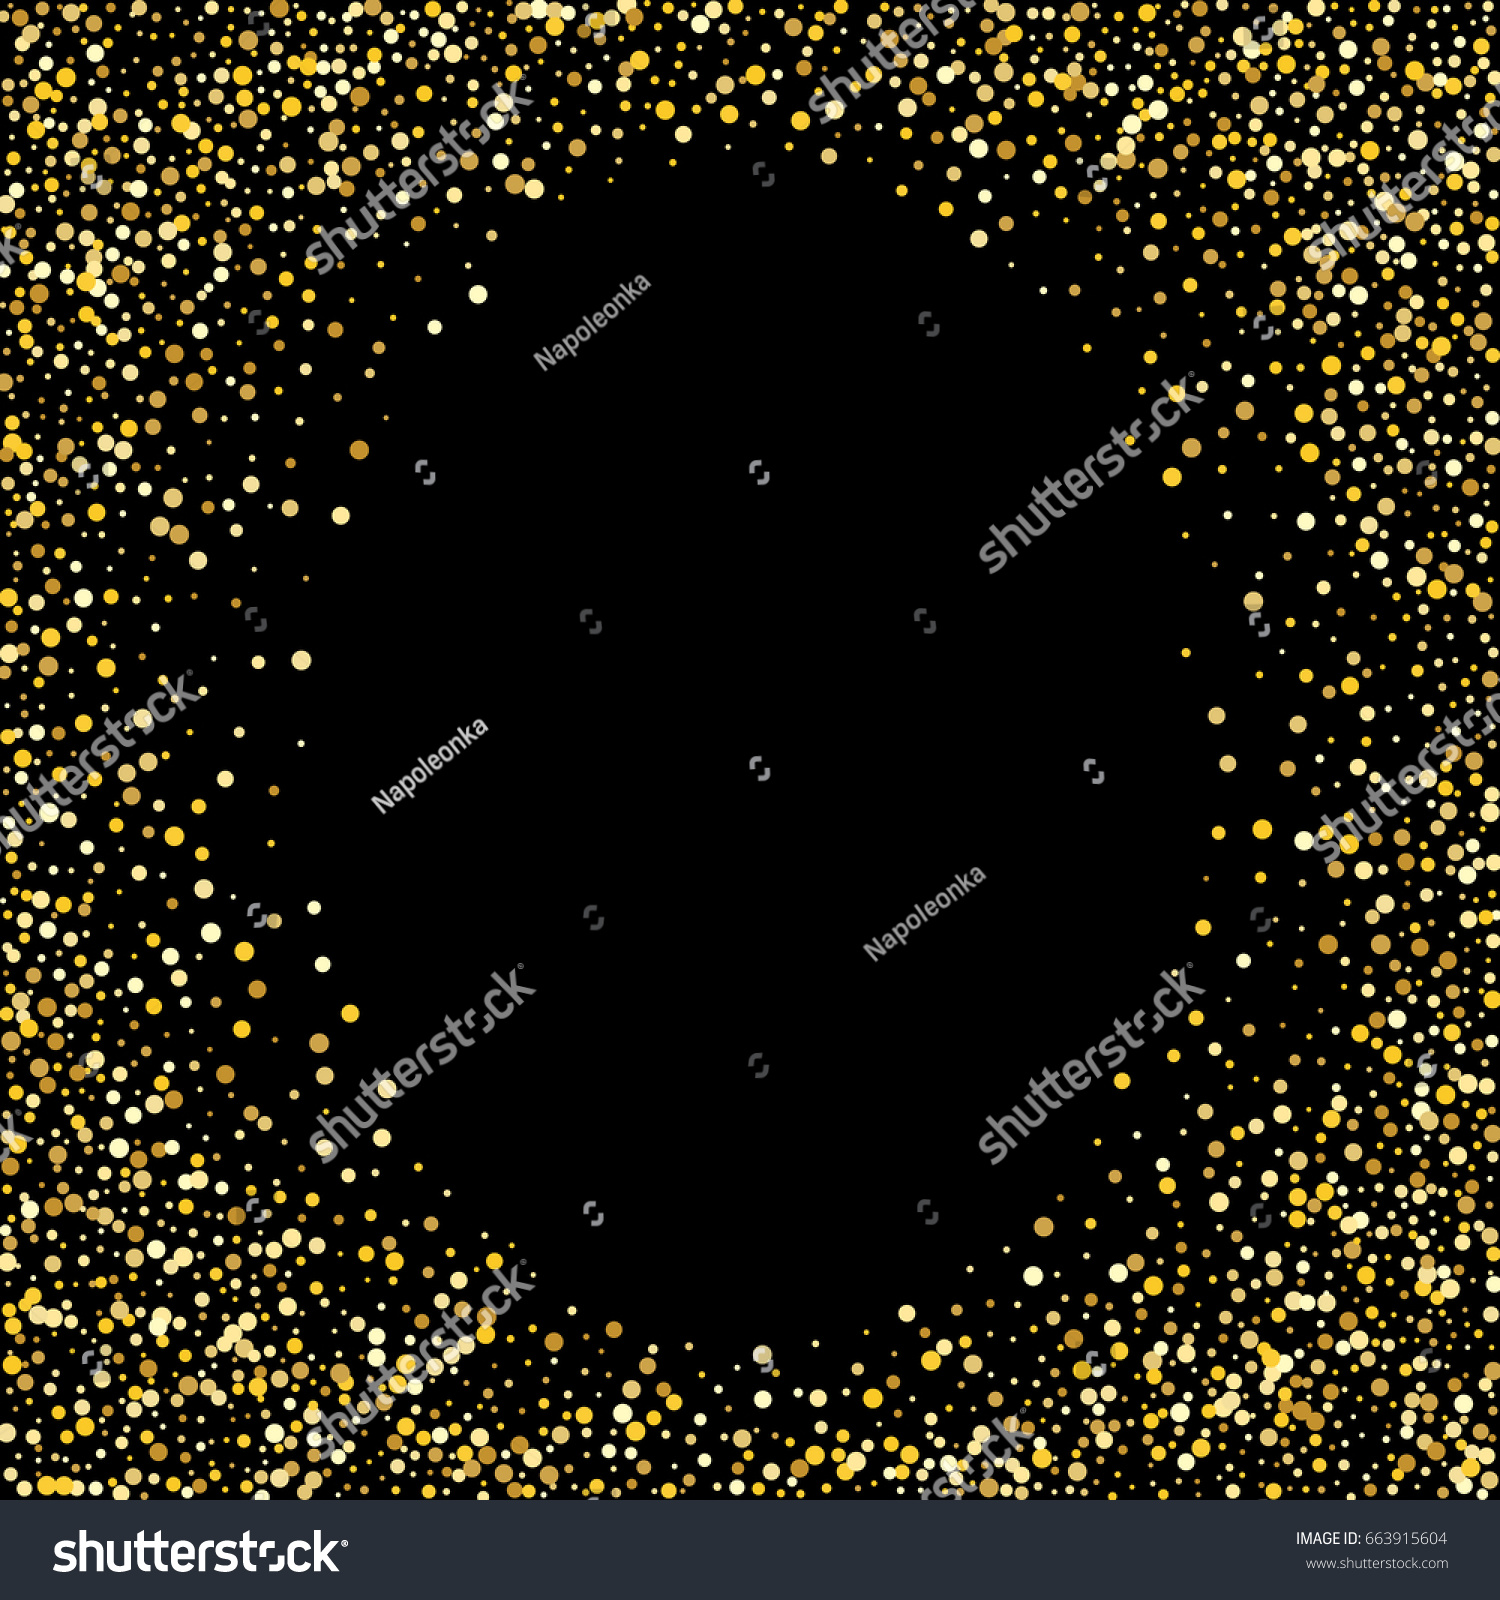 black and gold frame png. Gold Frame. Golden Square Oval Frame On Black Background. Glitter Template And Png ,